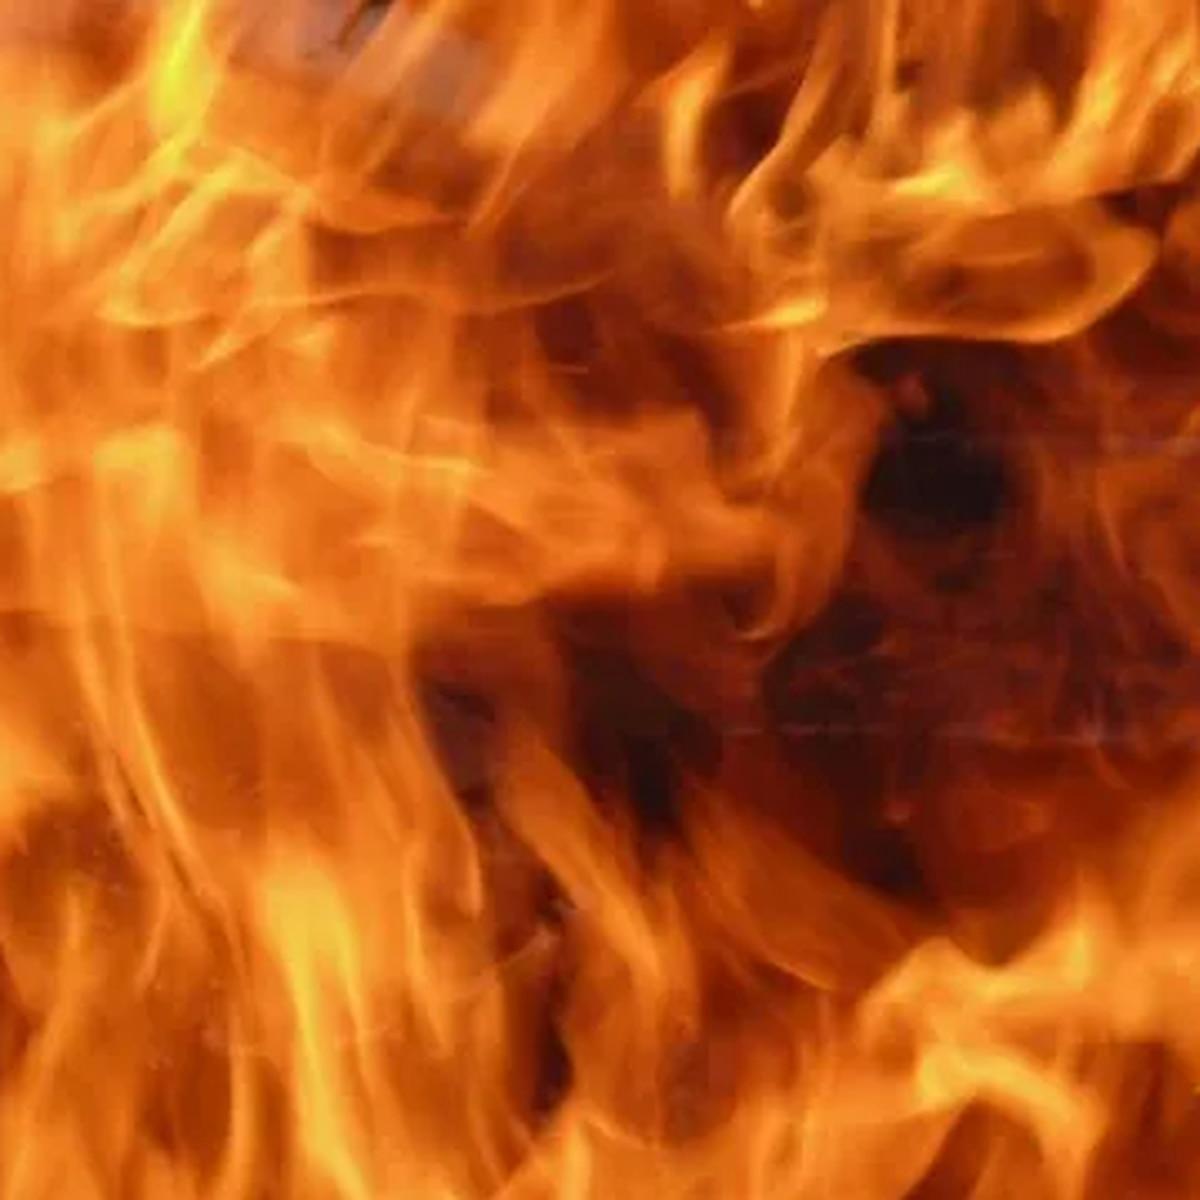 Crews on scene of structure fire on Duckenfield Avenue in Tyler